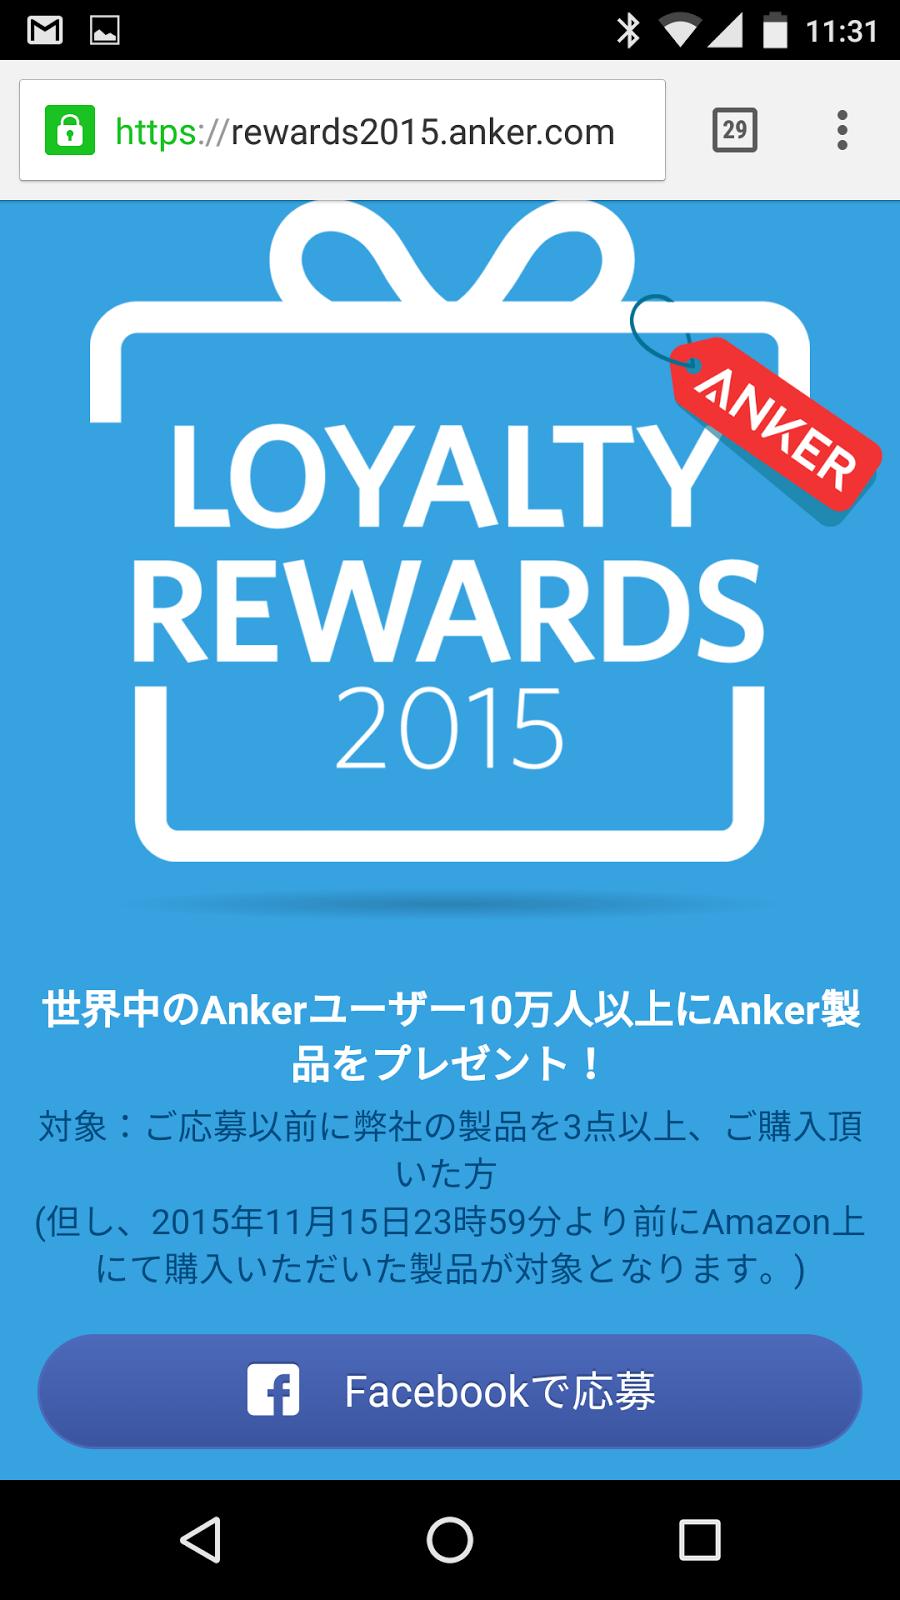 Mt coin login rewards / Cav coin offers hyderabad